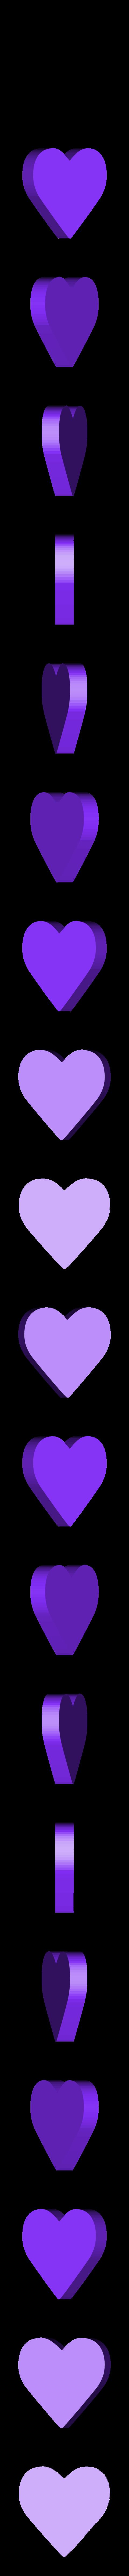 box-heart-top-s-001.stl Download free STL file Heart Shaped Box - Small • 3D printing template, GadgetPrint